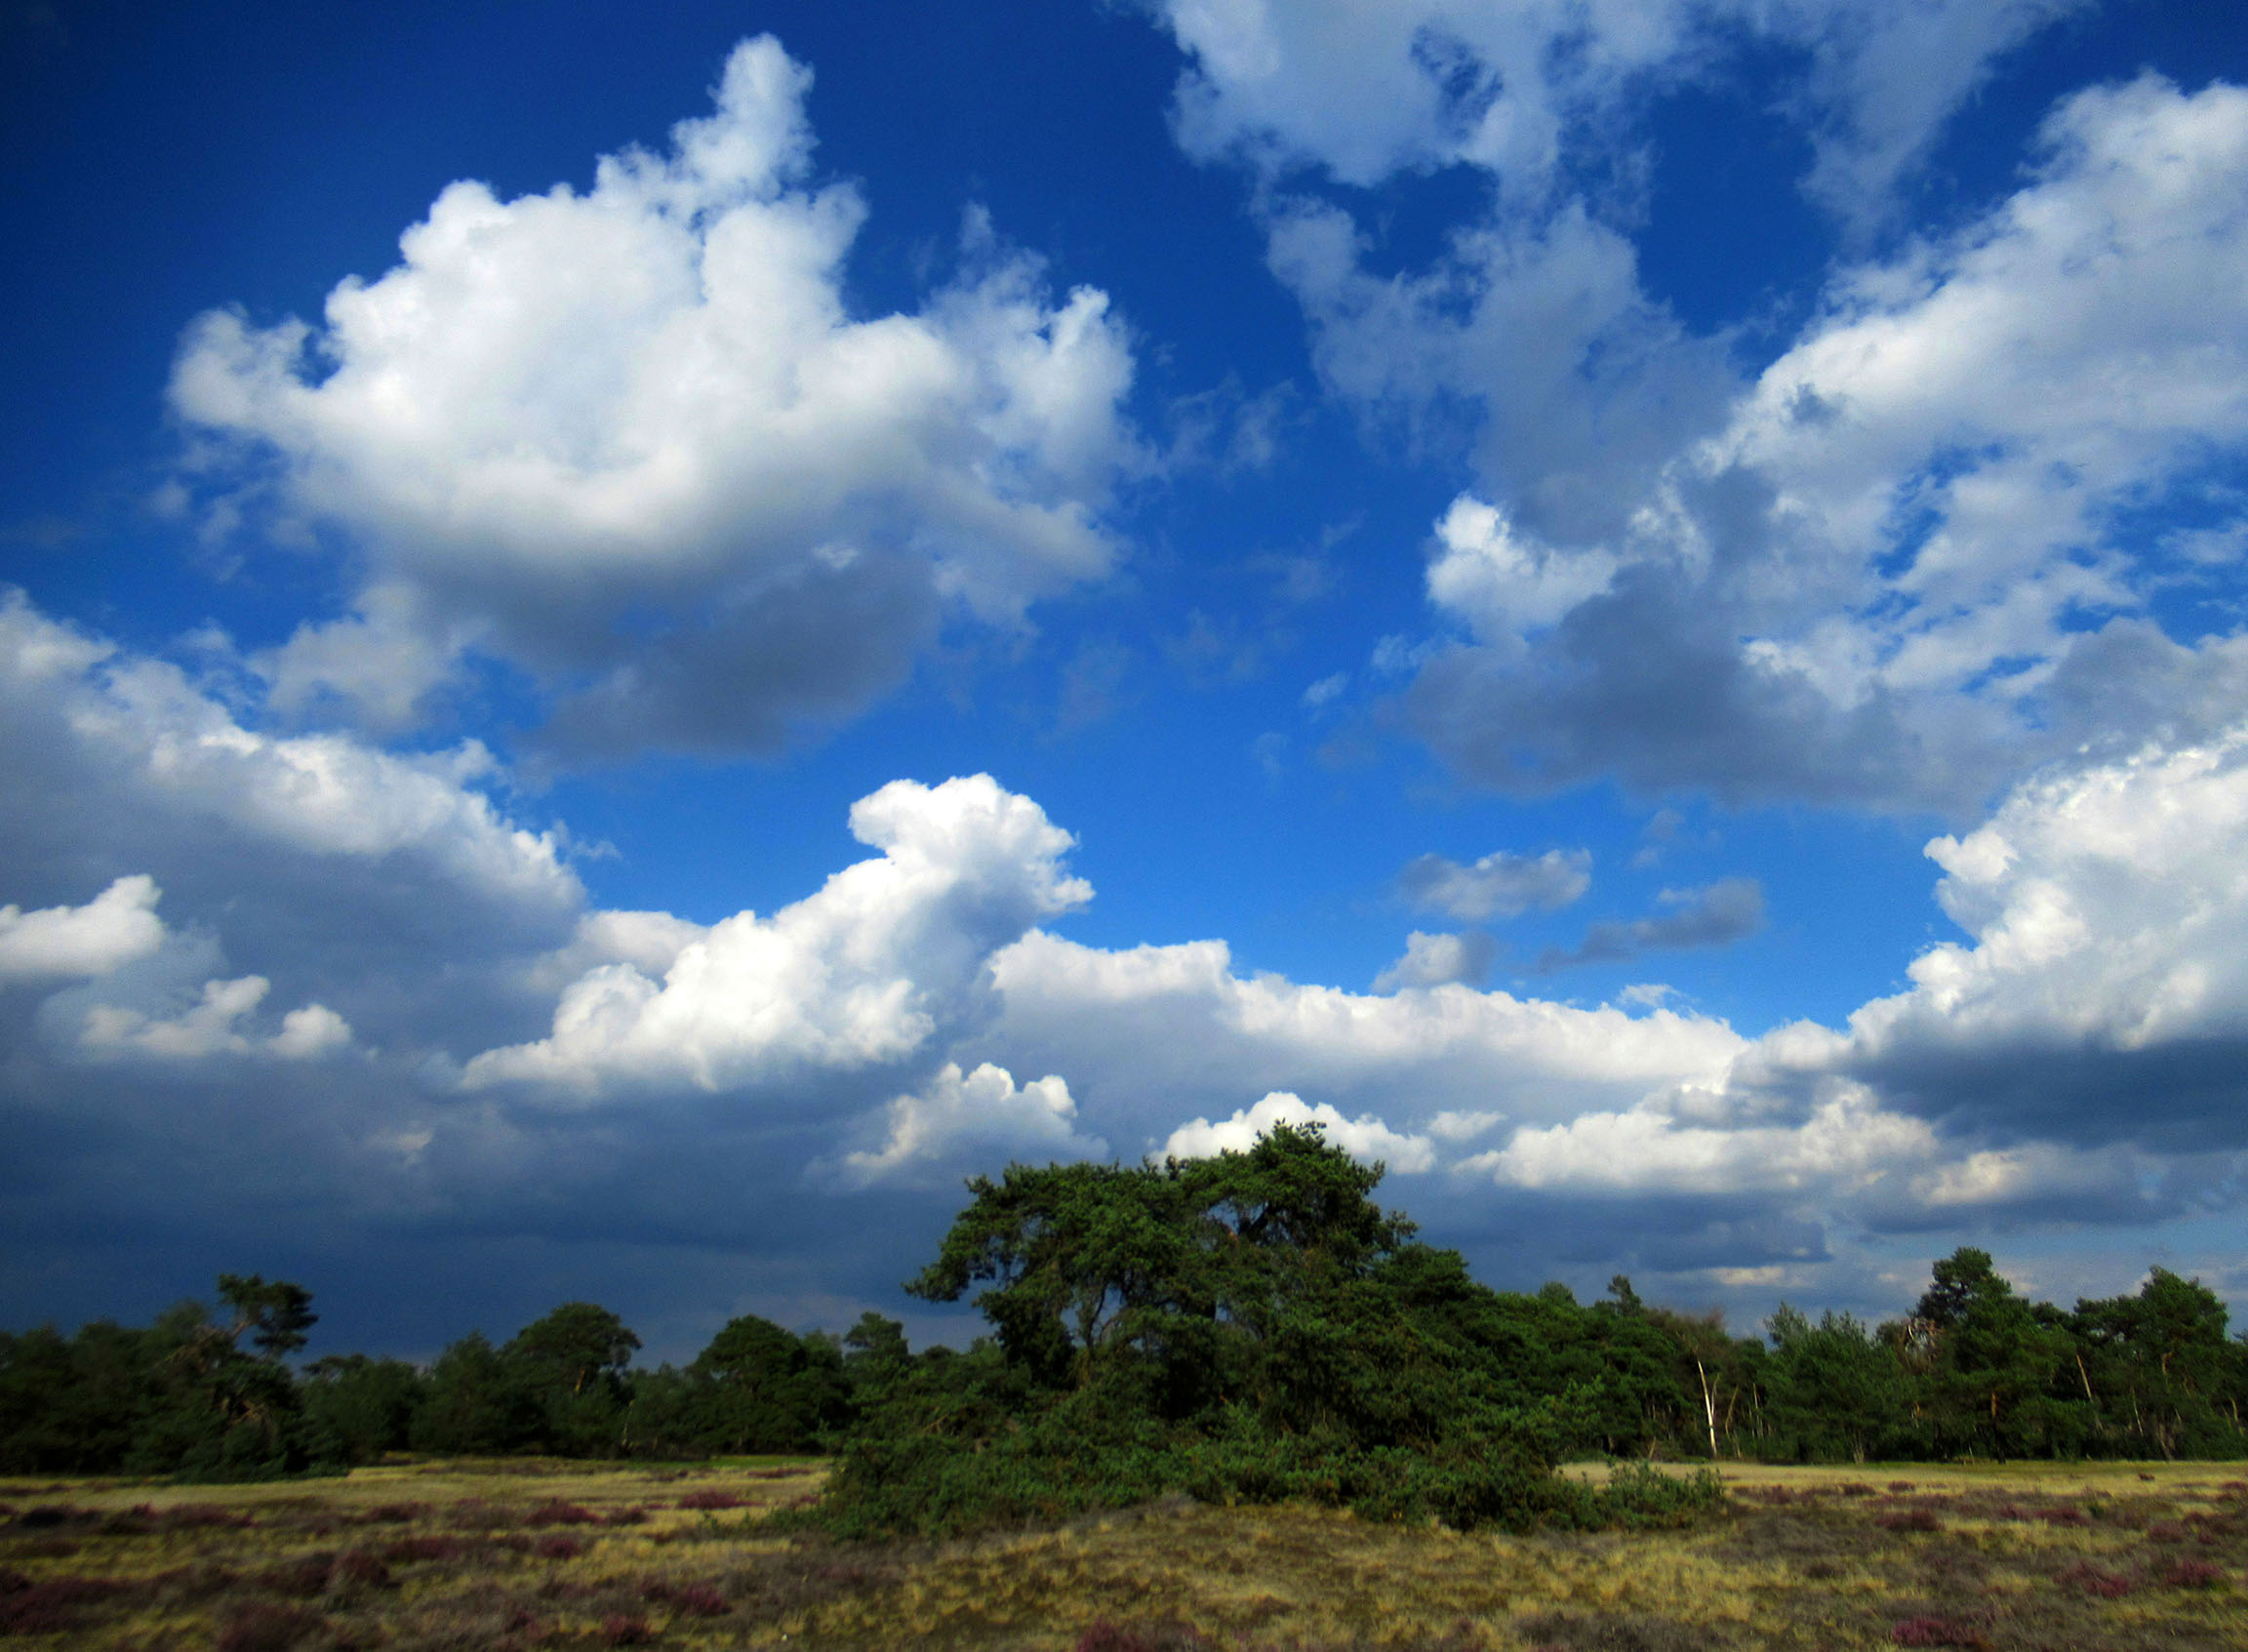 Bij zulke mooie wolkenluchten kun je je fantasie de vrije loop laten – Foto: ©Louis Fraanje